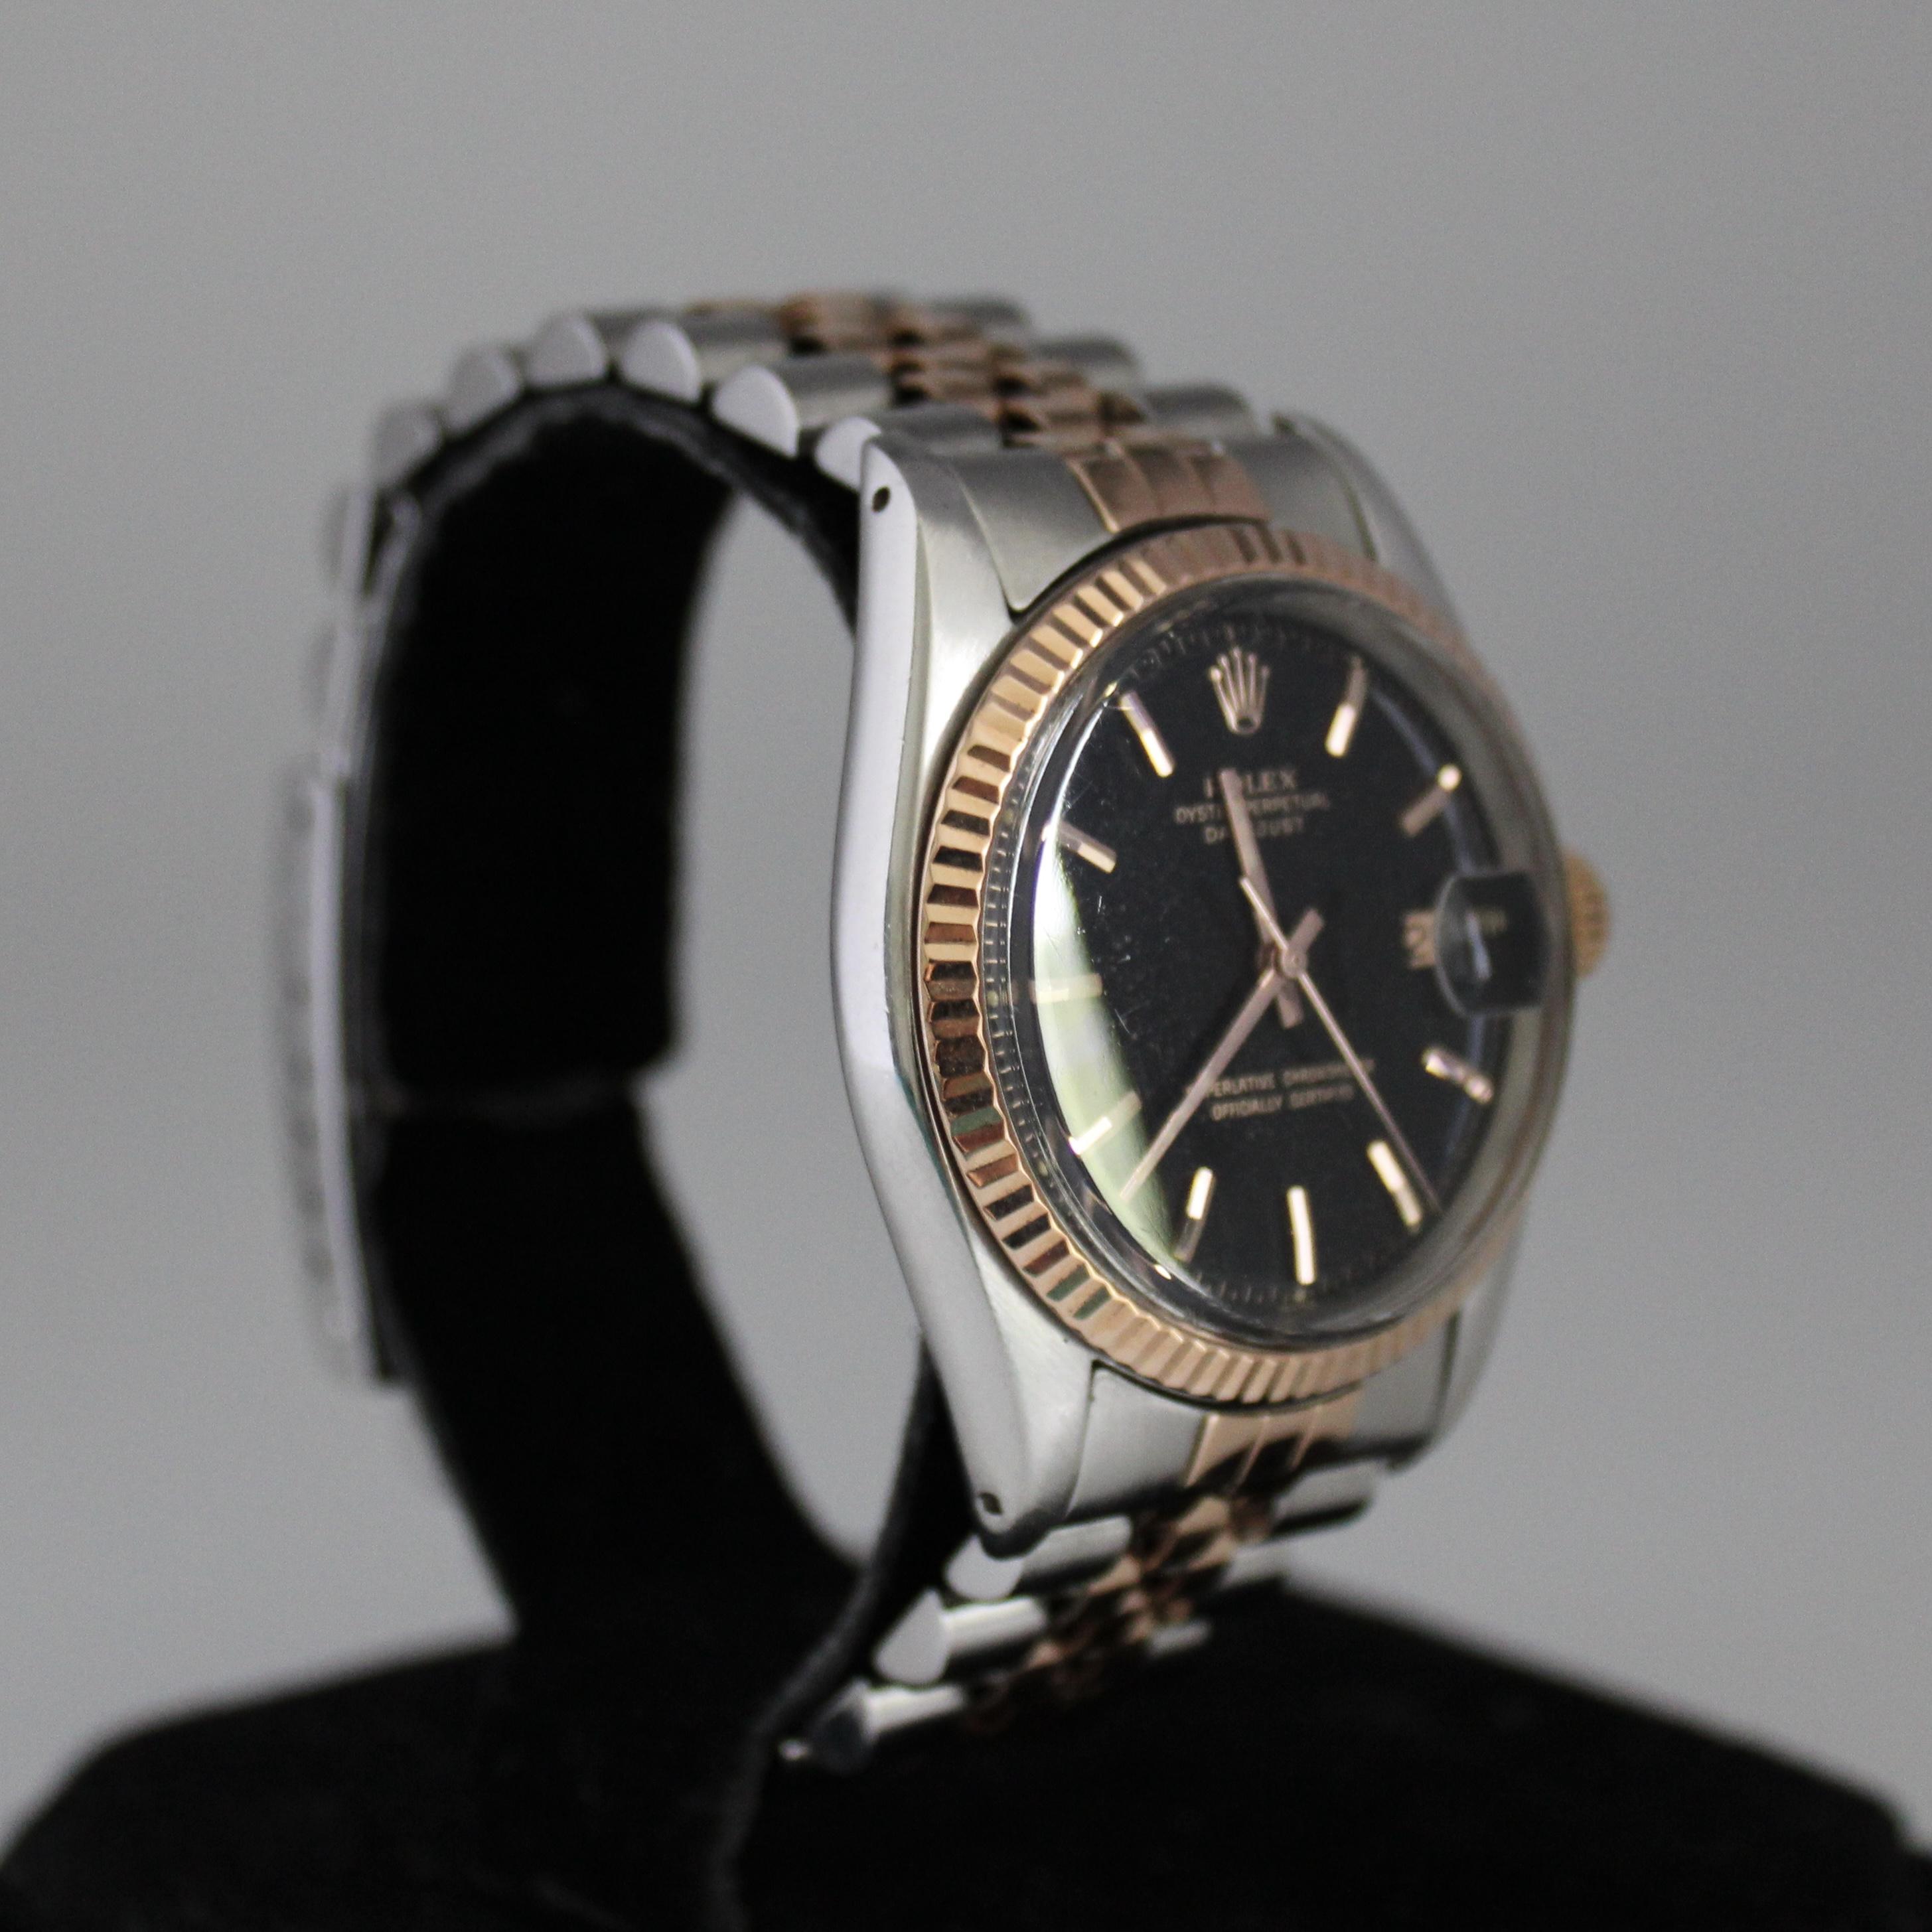 Rolex Datejust ref 1601 Steel & Pink Gold - Image 5 of 8